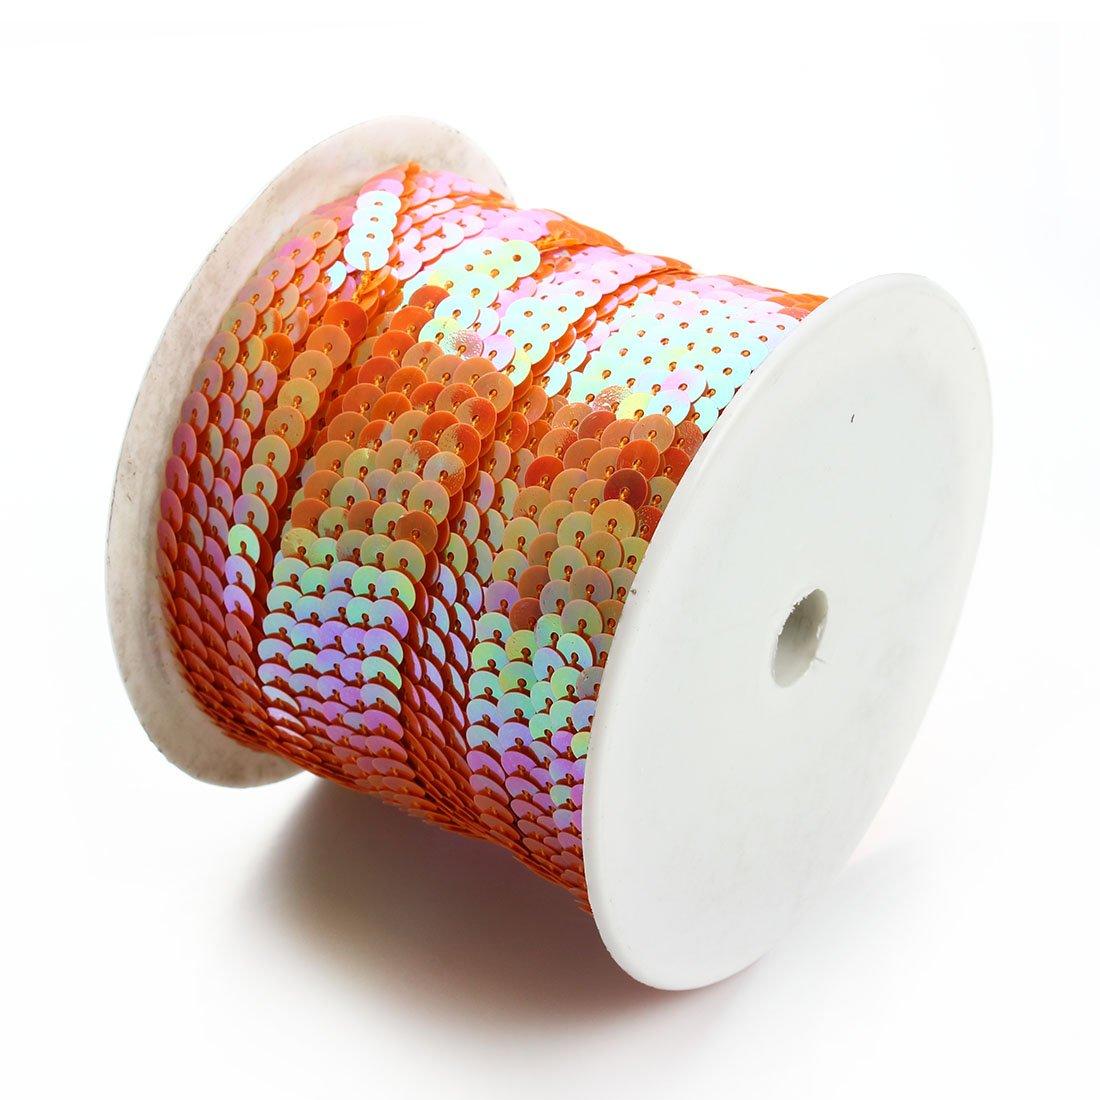 Linsoir Beads Spangle Flat Sequins Paillette Trim Spool String 6mm Sequins 100 Yards Gold Color